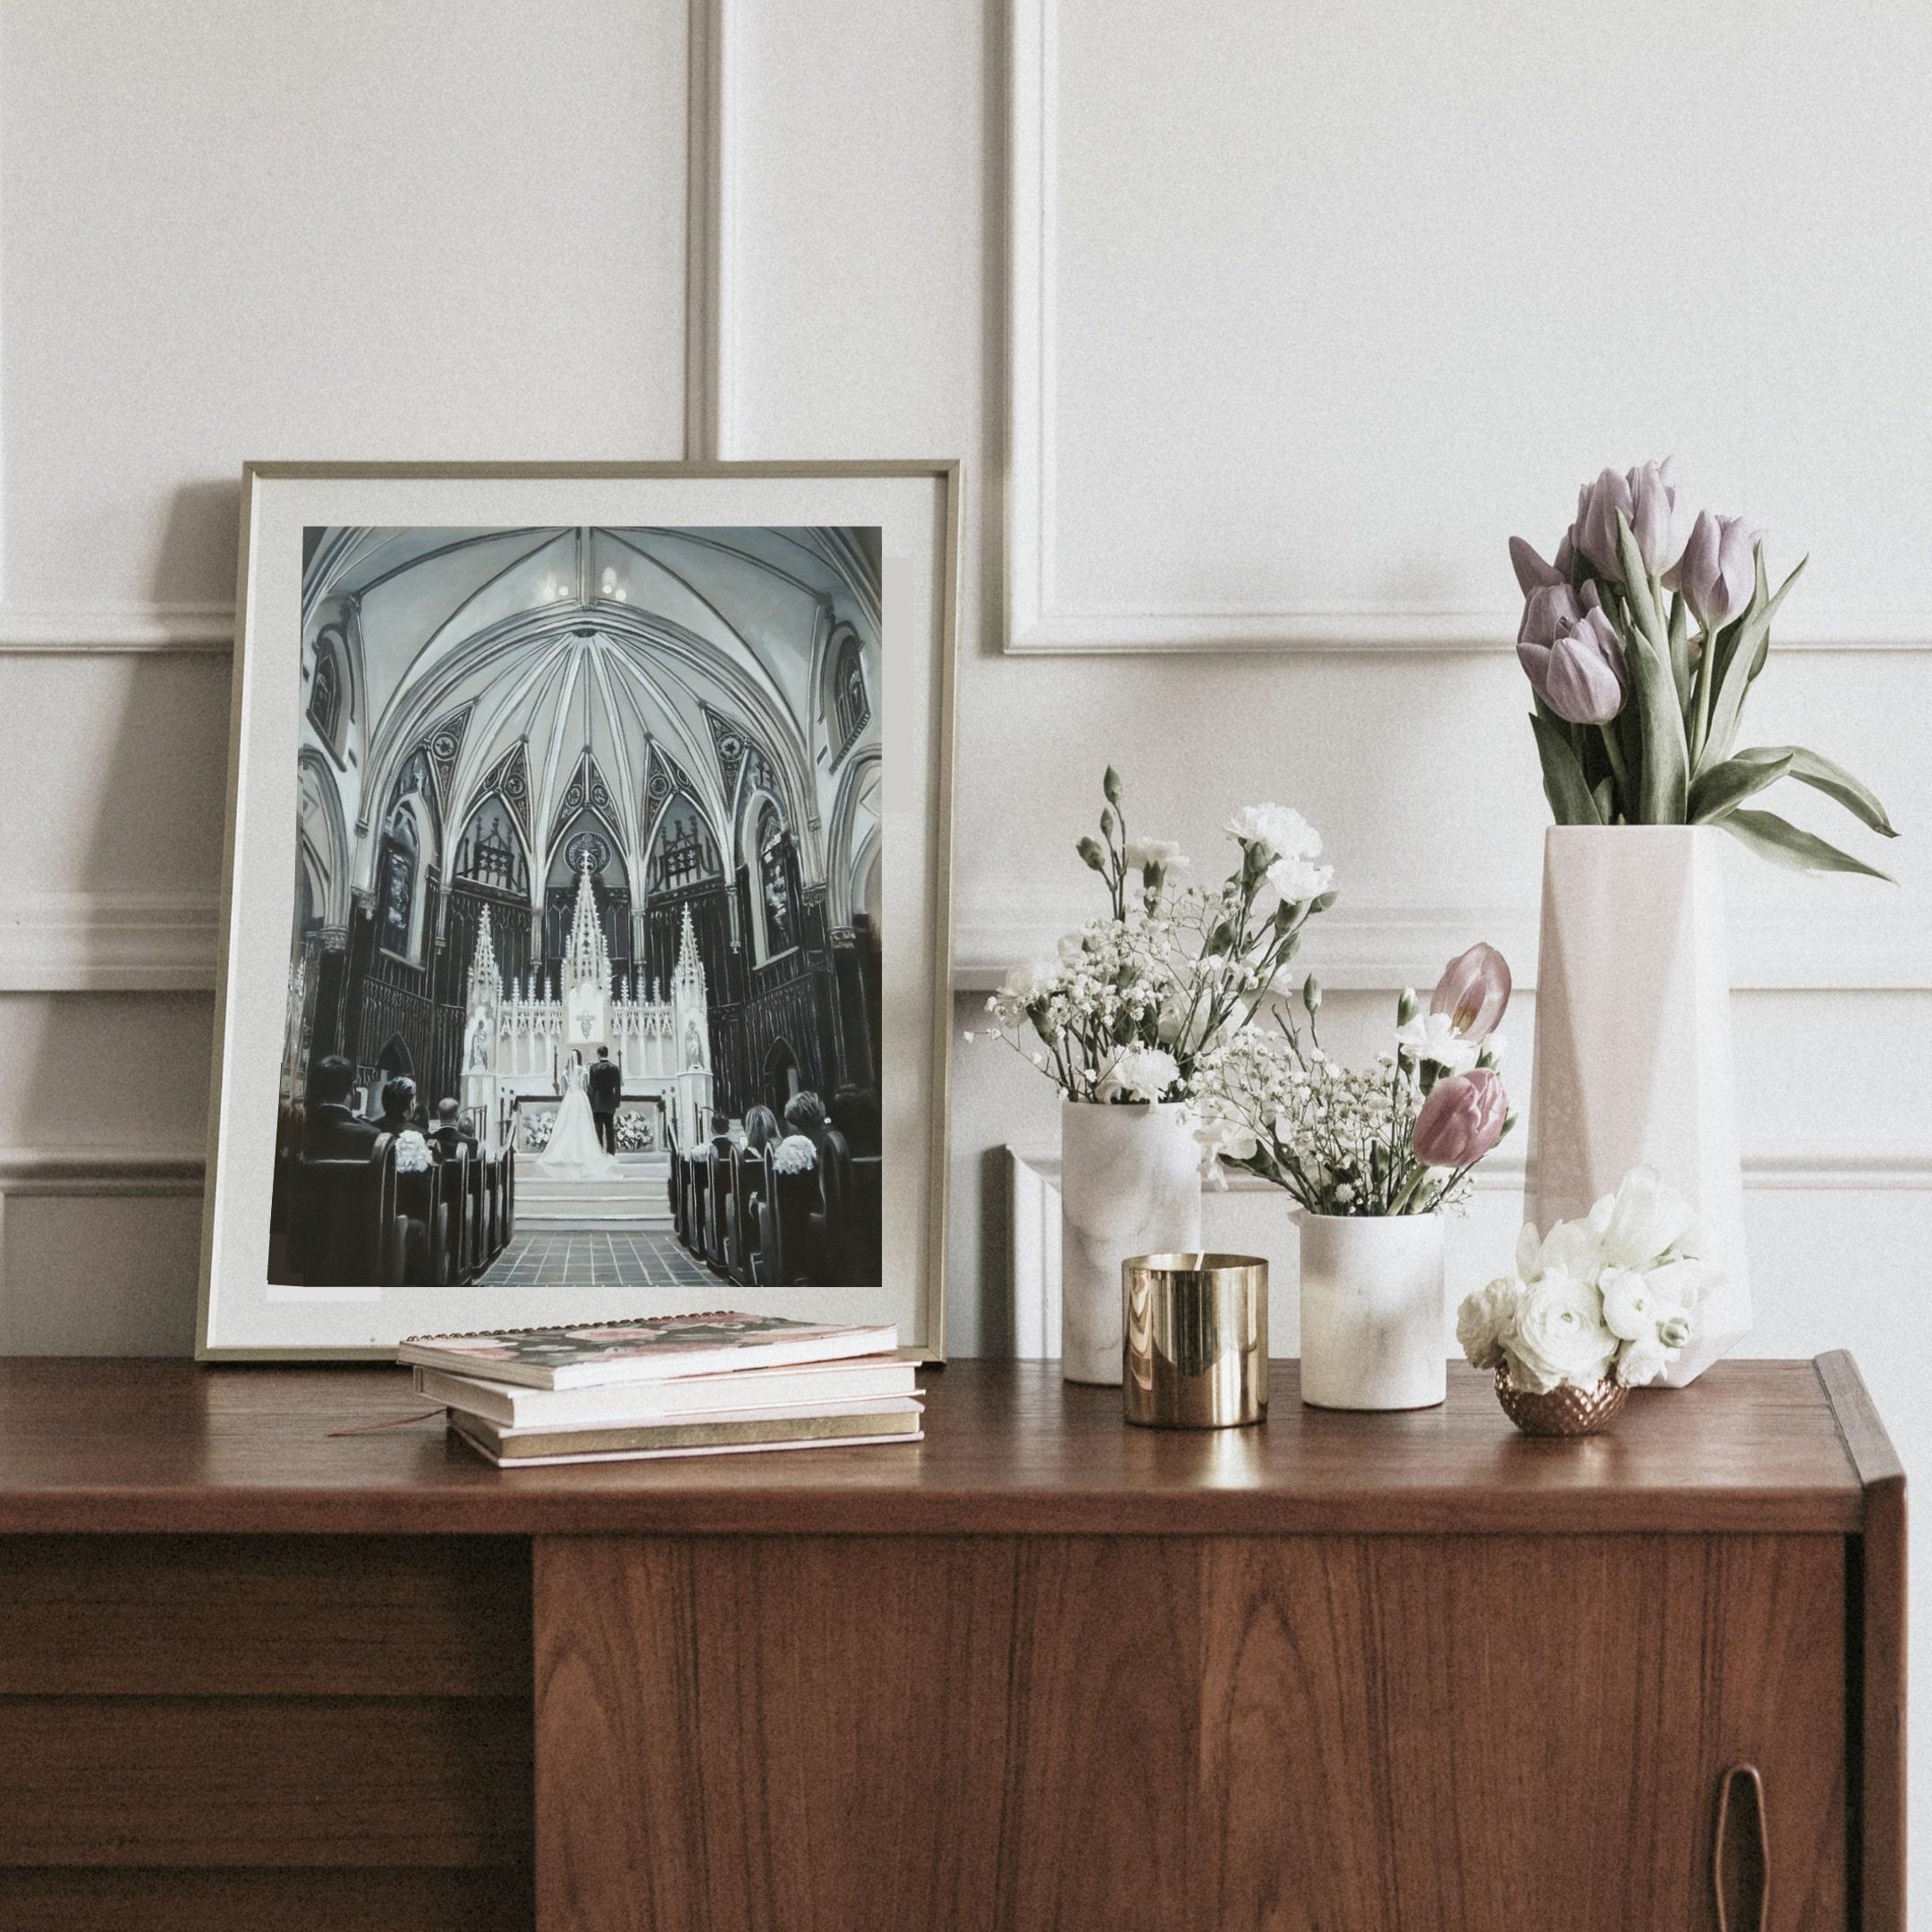 blackandwhite-cathedral-wedding-painting-min